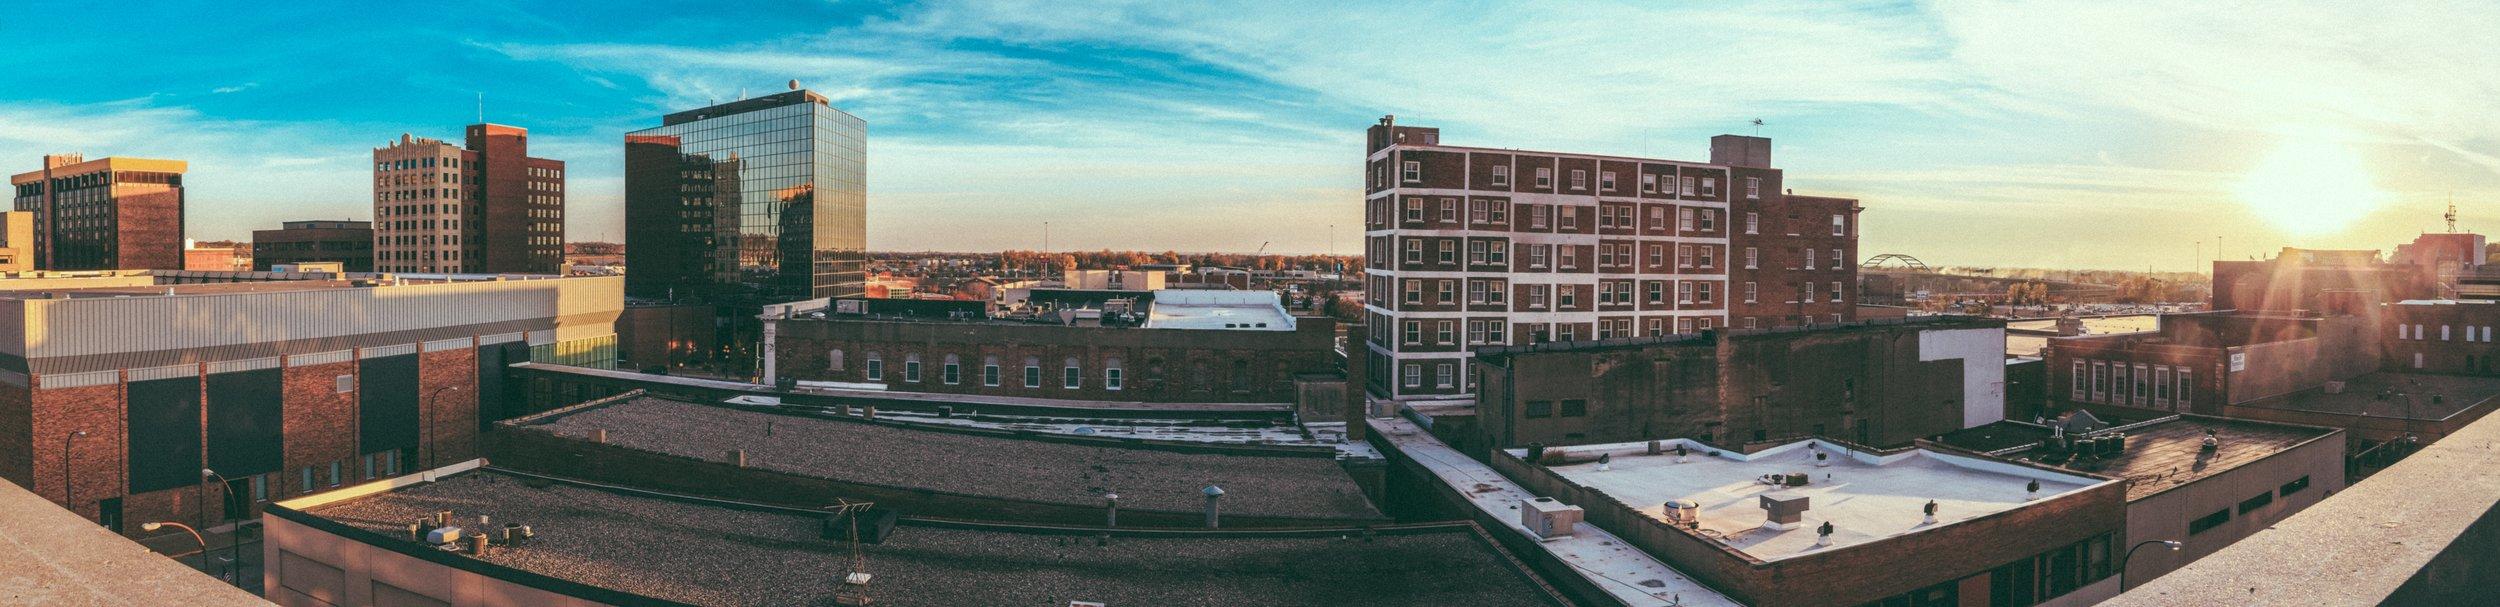 Downtown Pano-669.jpg